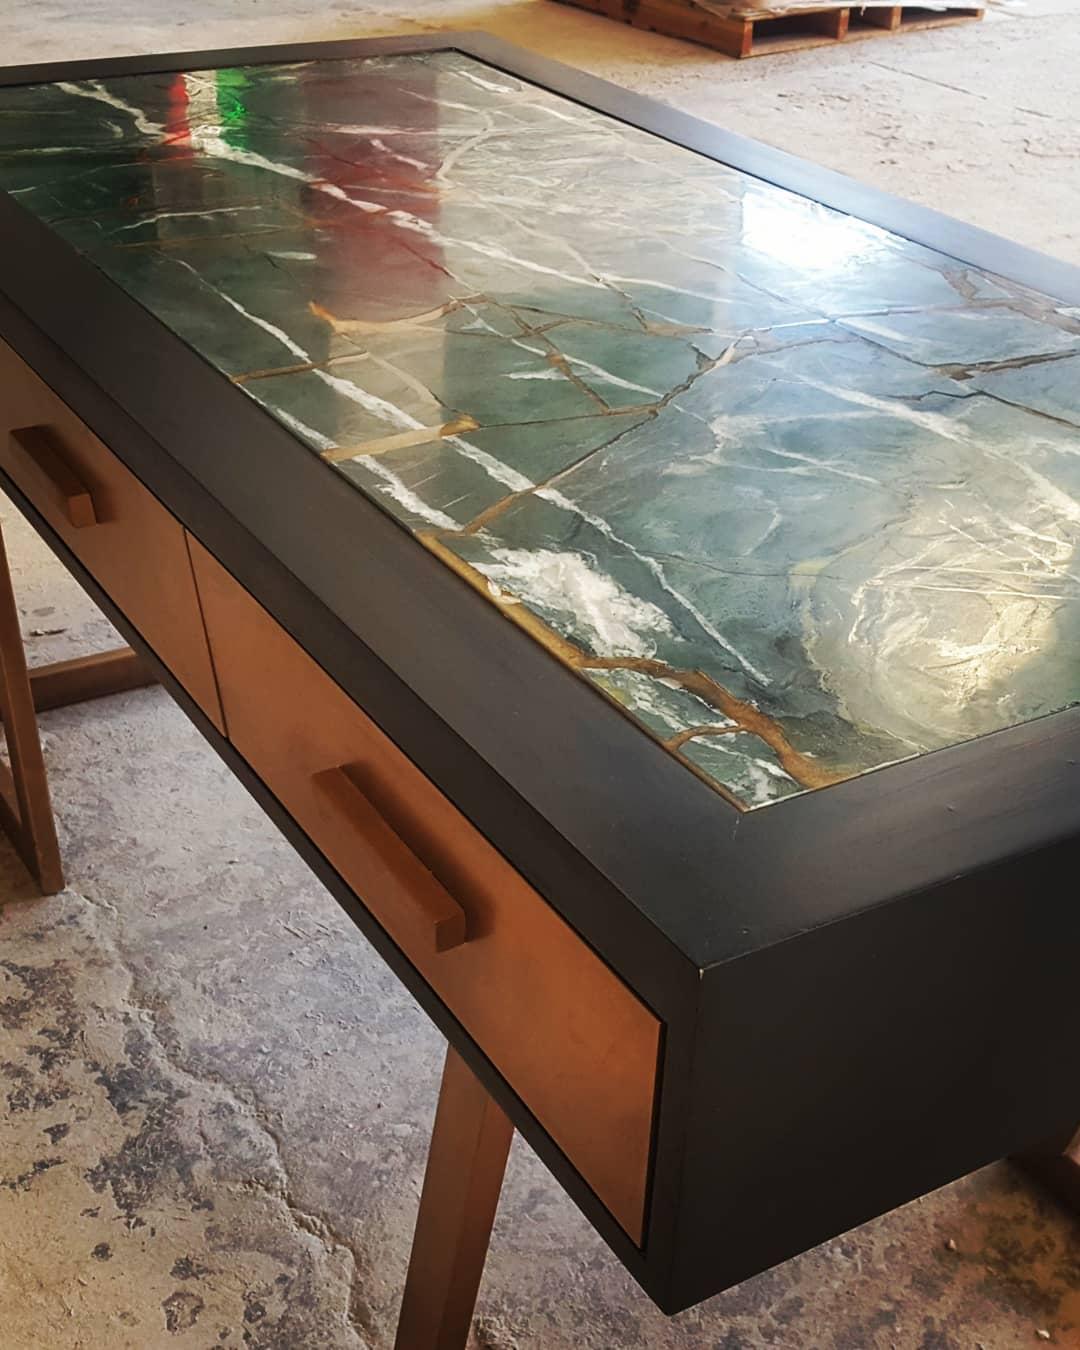 "● Serie Kintsugi い 繕 い, ""reparação de ouro"" # Púlsarmx #goldenpowder #designer #marble ..."